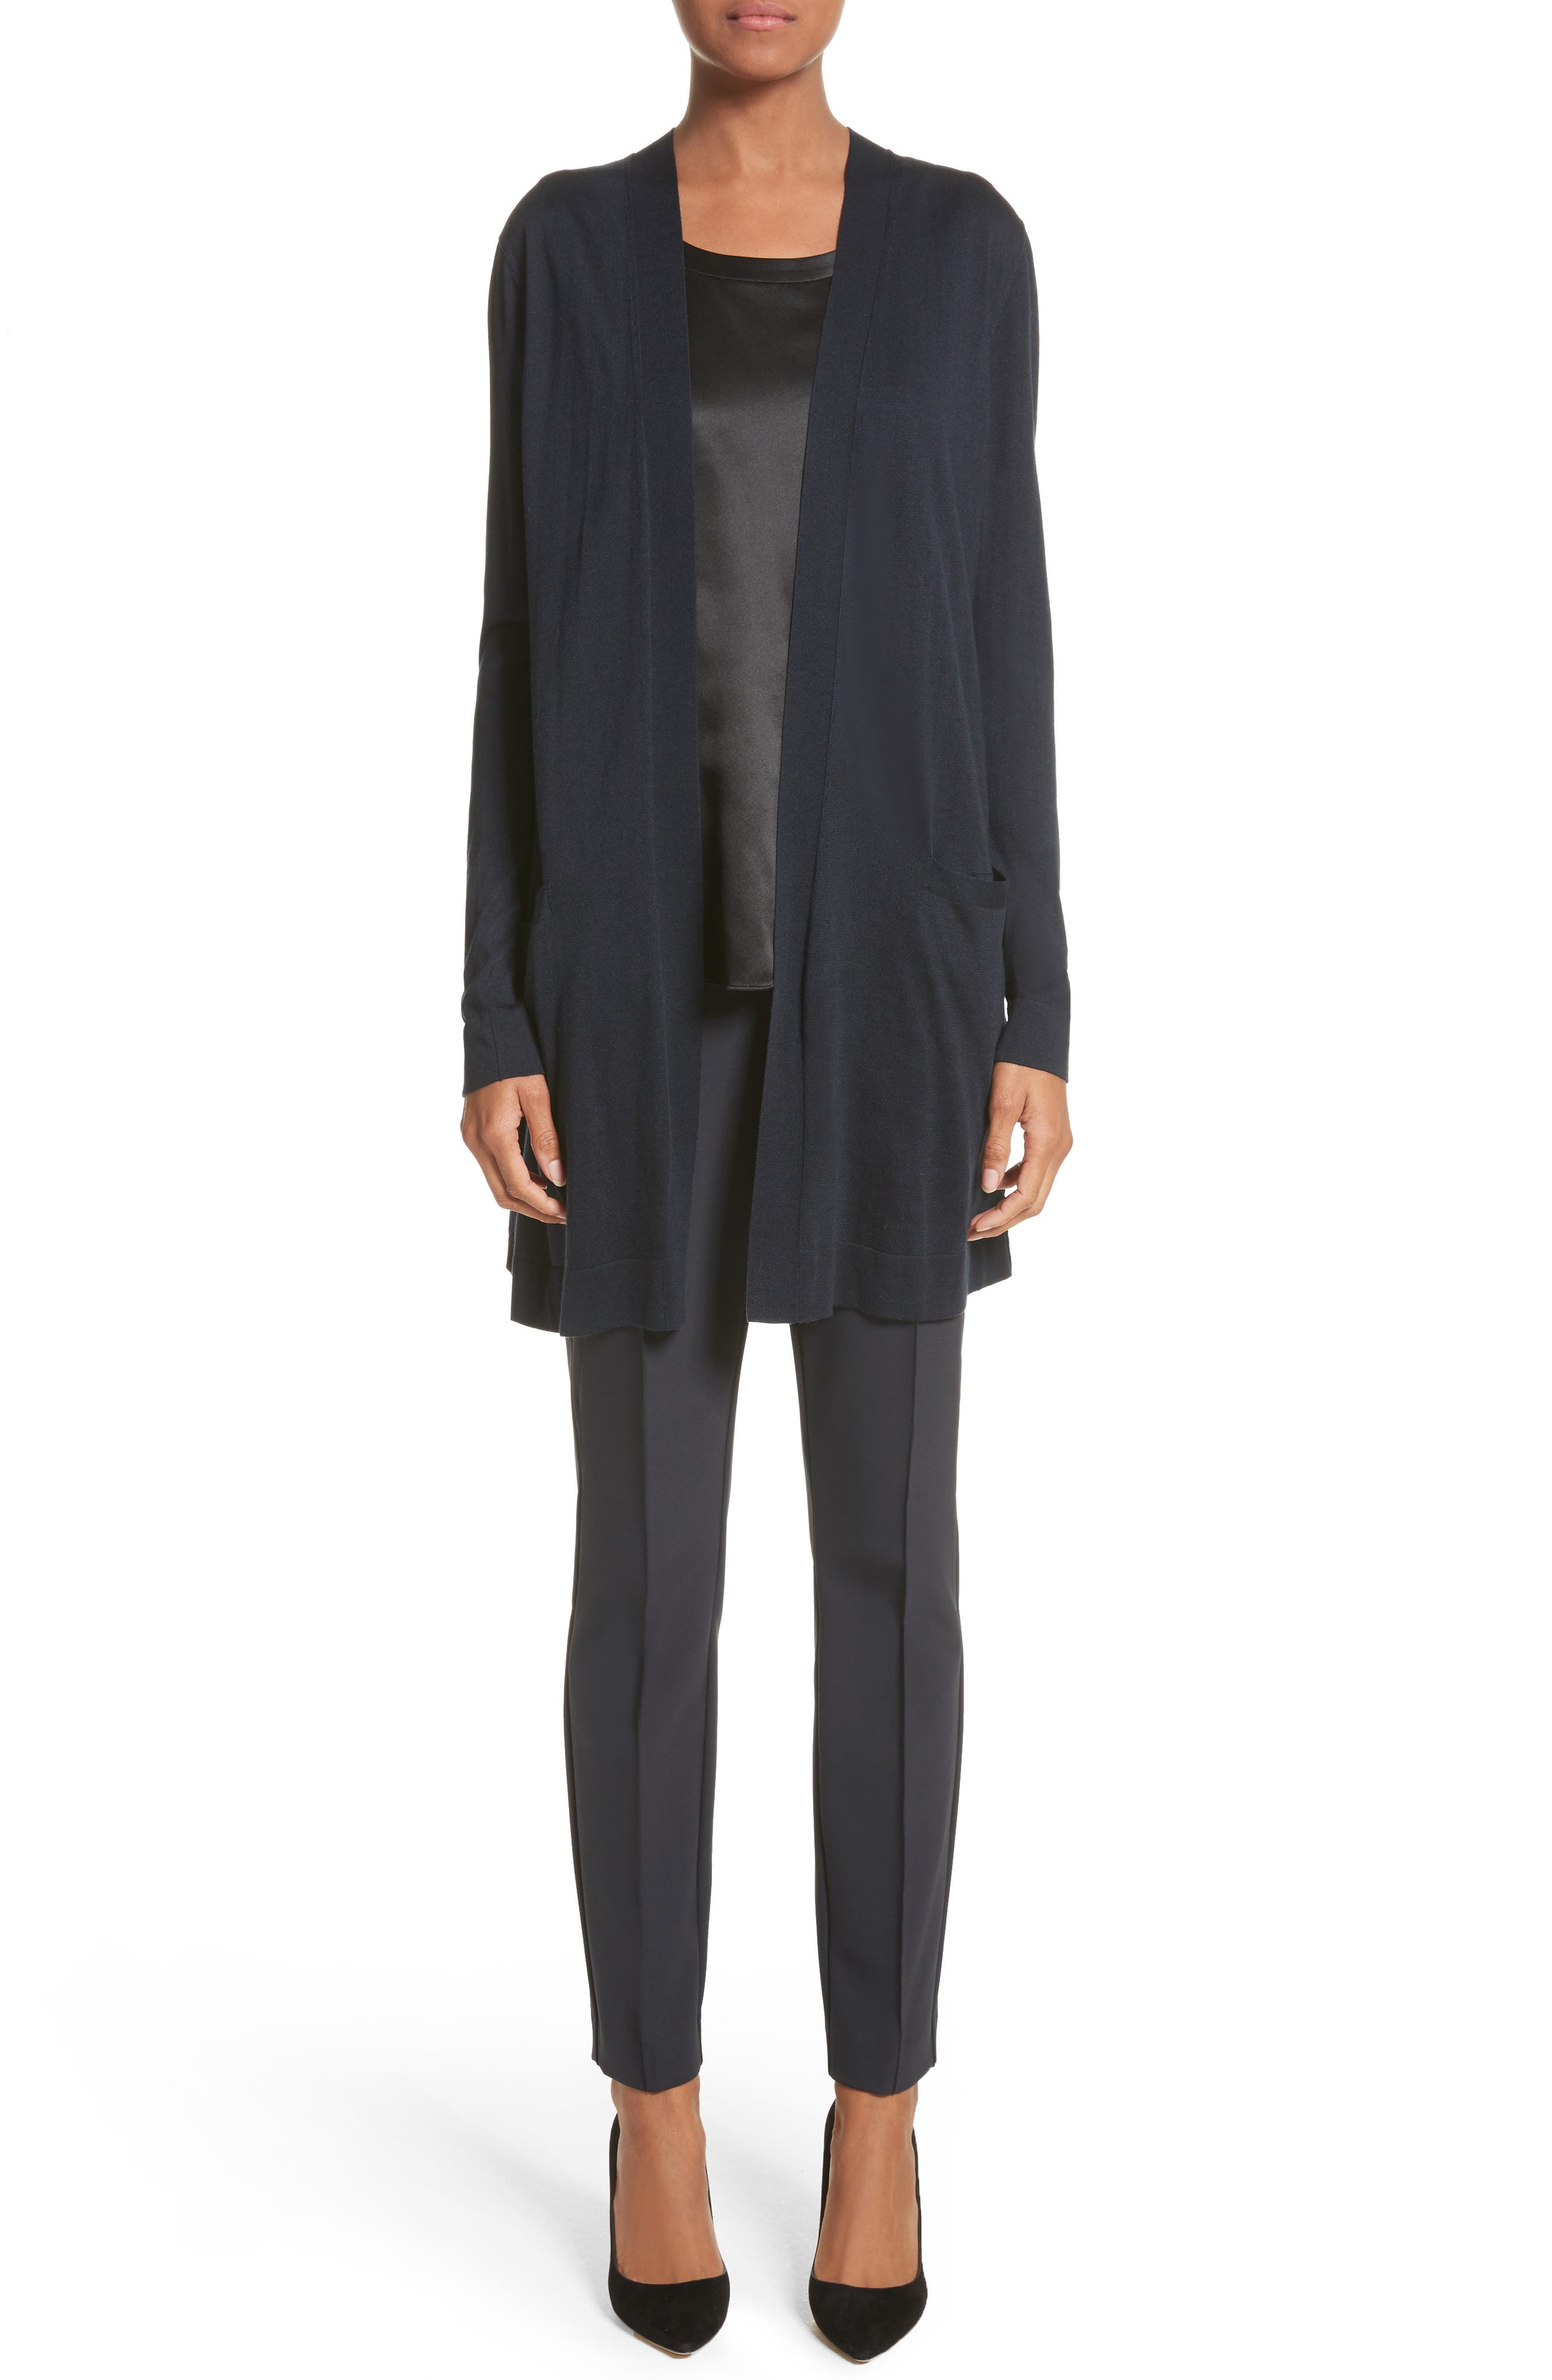 LAFAYETTE 148 NEW YORK, Perla Reversible Silk Blouse, Alternate thumbnail 7, color, BLACK